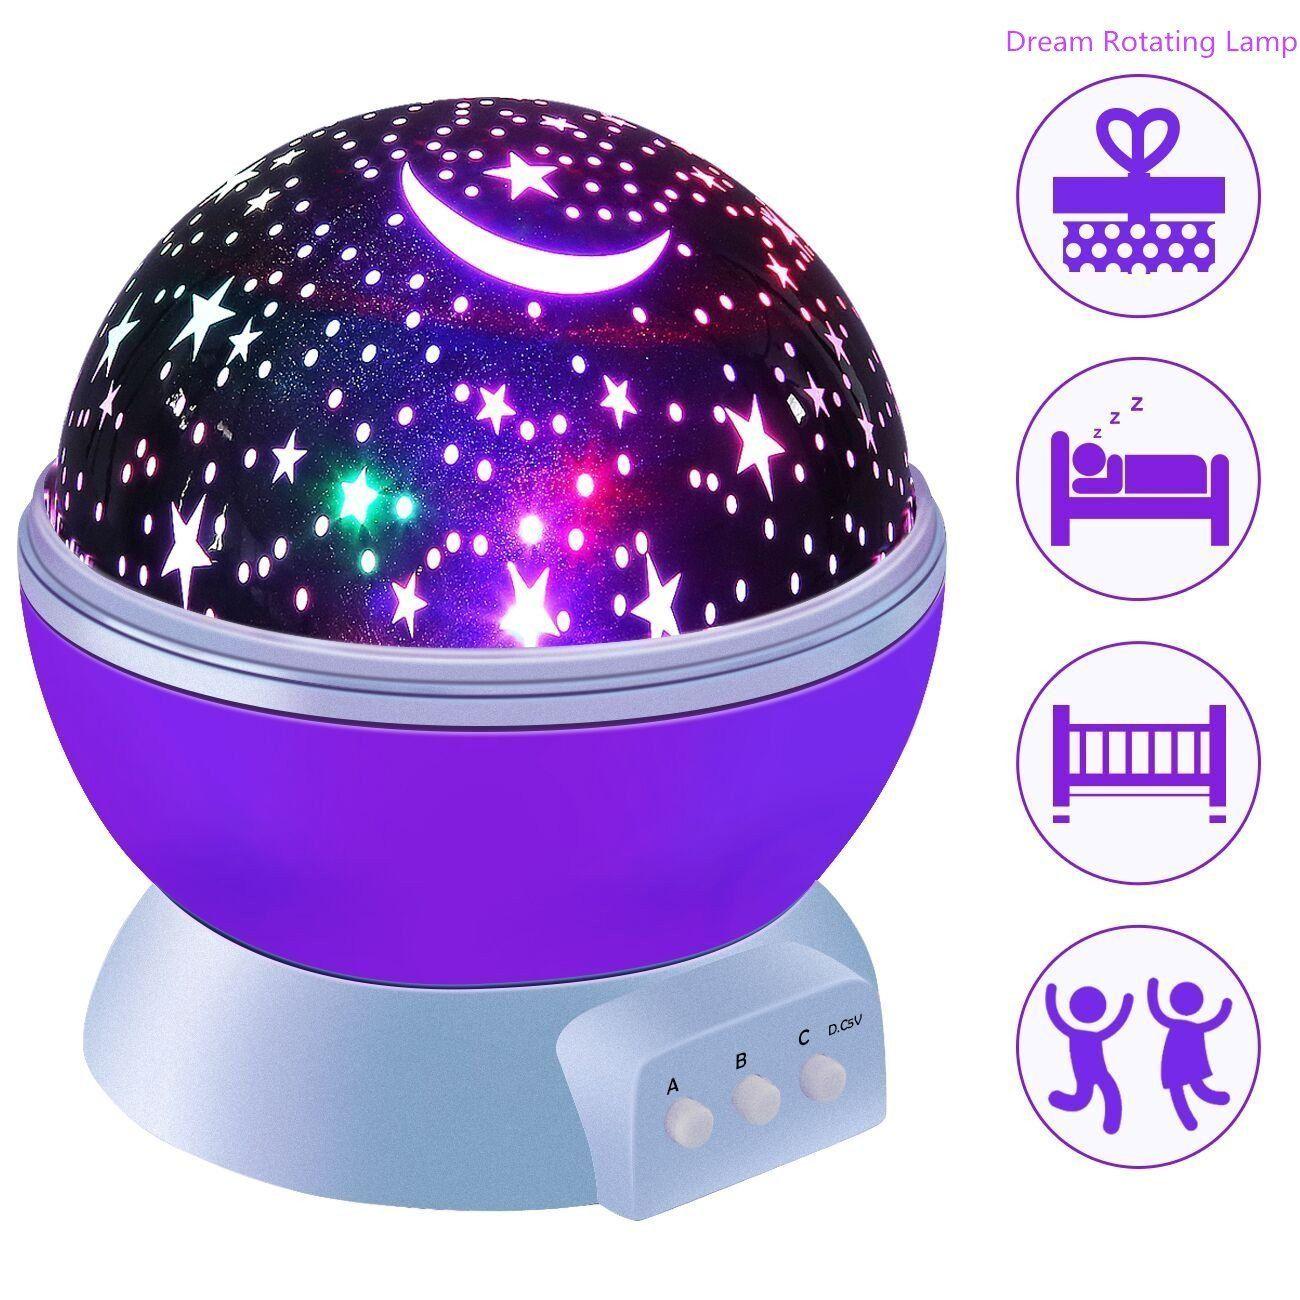 Star Projector Lamp New Generation Novelty Starry Night Light 360 Degree Led Rotating Cosmos Projector Star Projector Lamp Star Night Light Baby Night Light